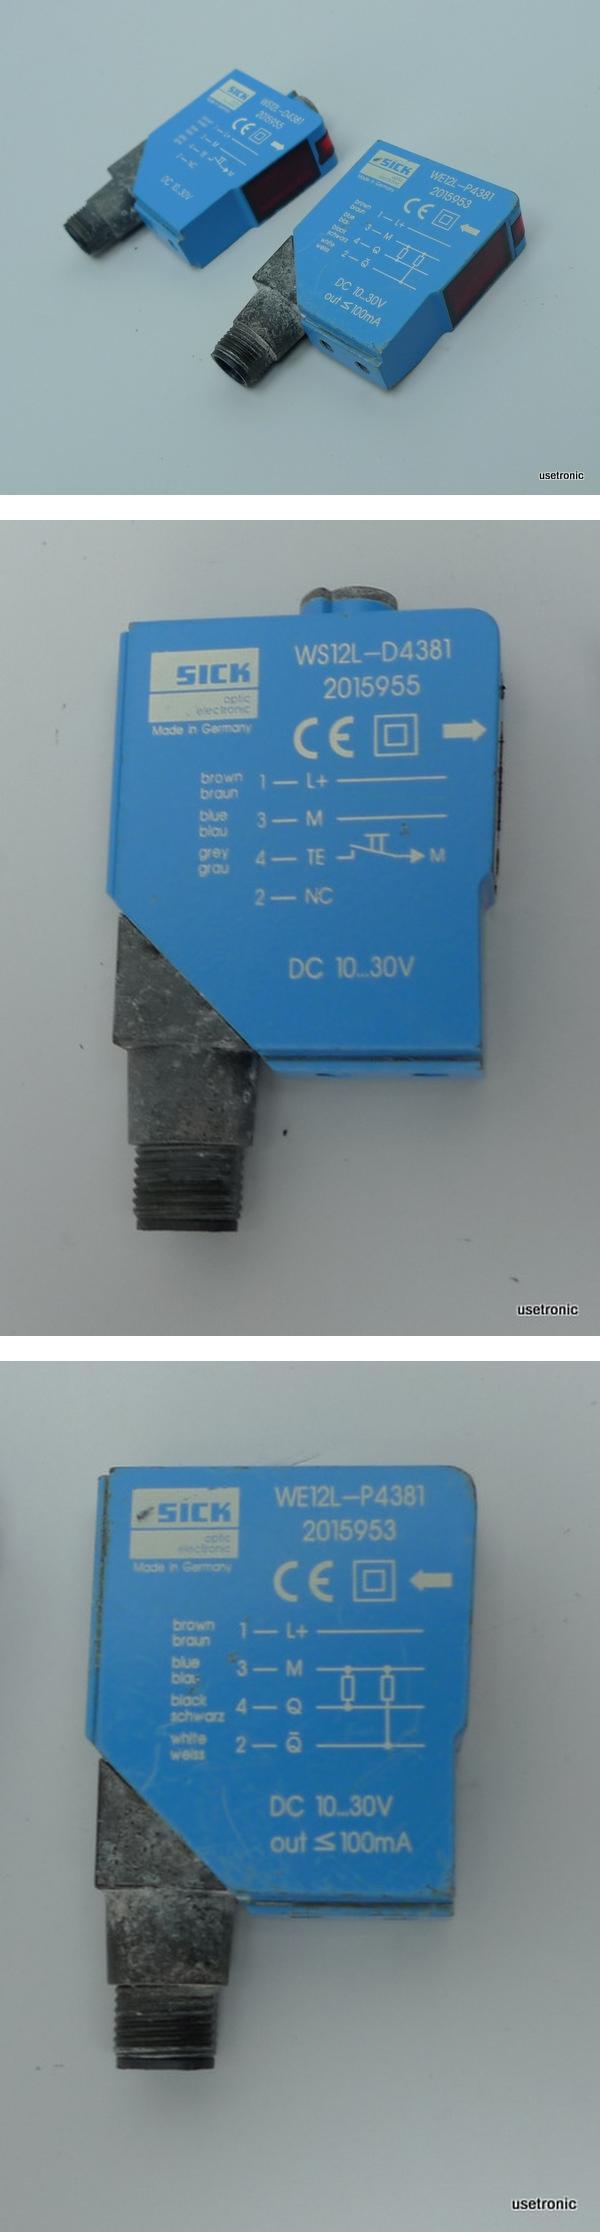 Sick Lichtschranke WS12L-D4381 WE12L-P4381